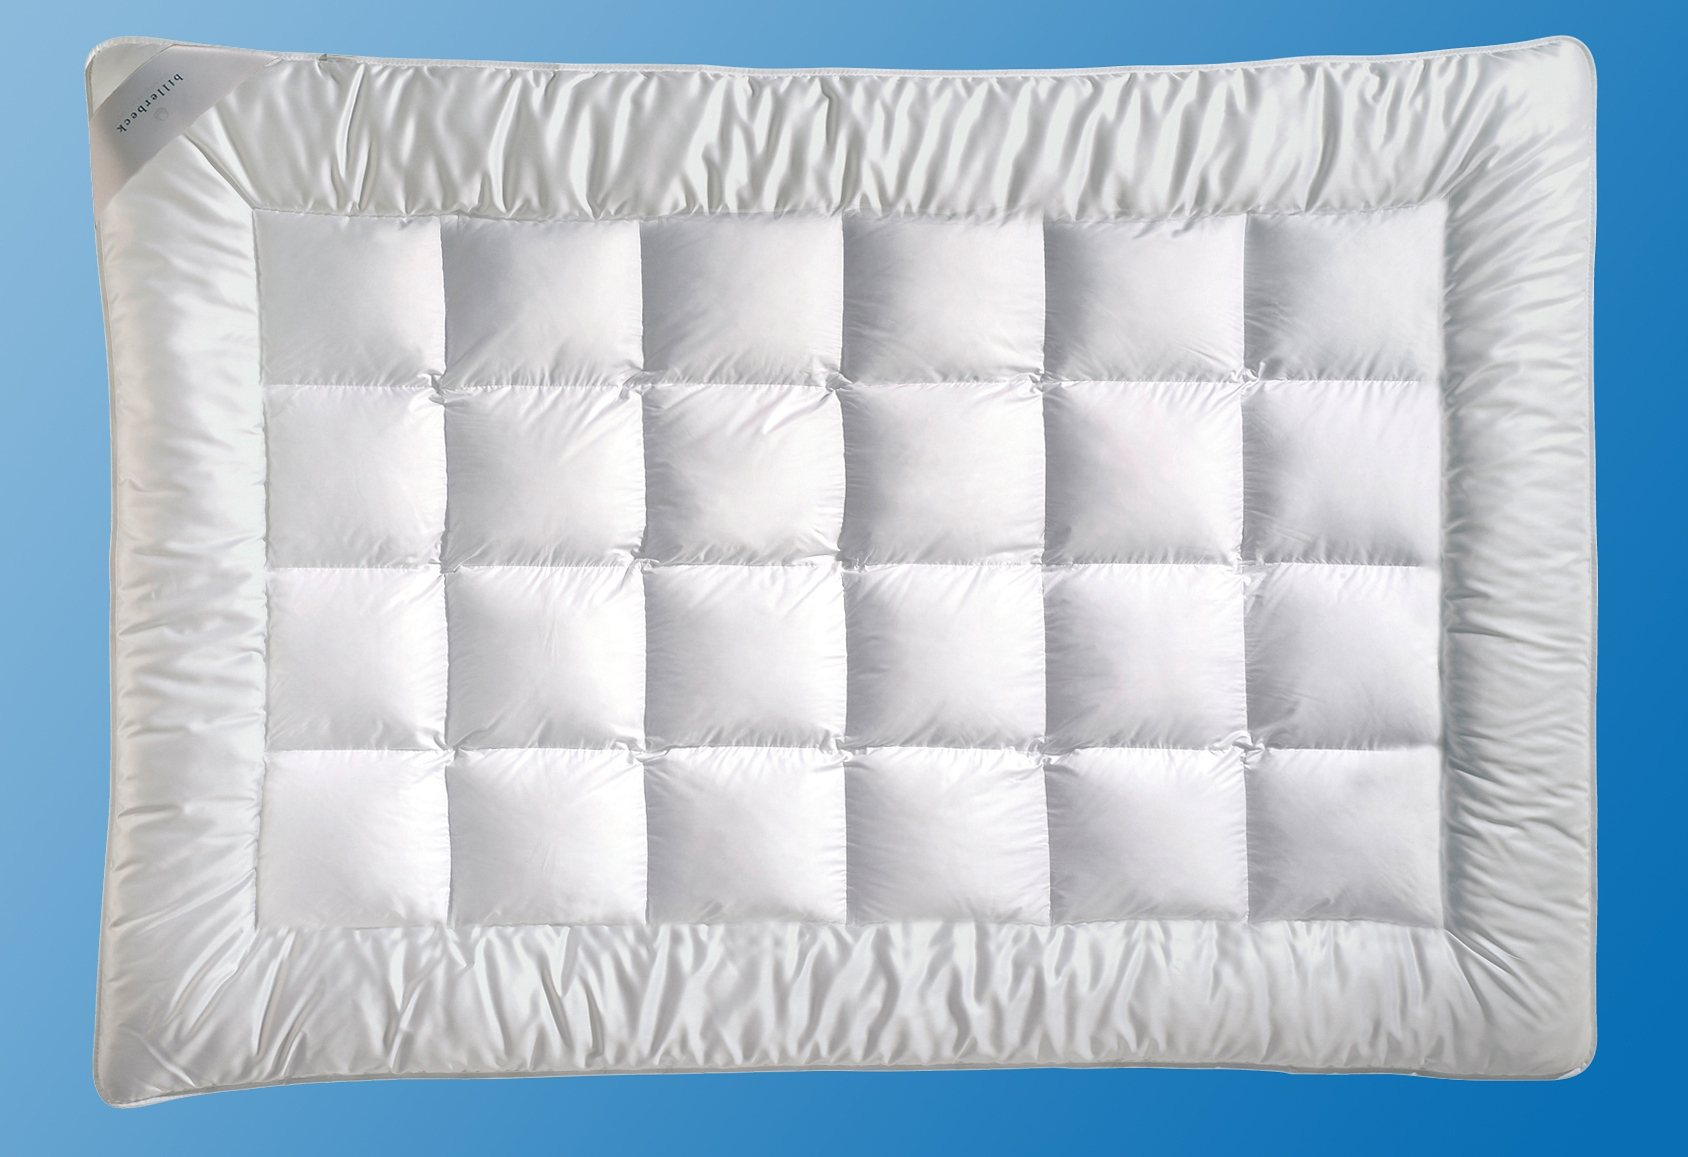 Microfaserbettdecke, »Pamina Uno«, billerbeck, normal, (1-tlg) | Heimtextilien > Decken und Kissen > Bettdecken | billerbeck